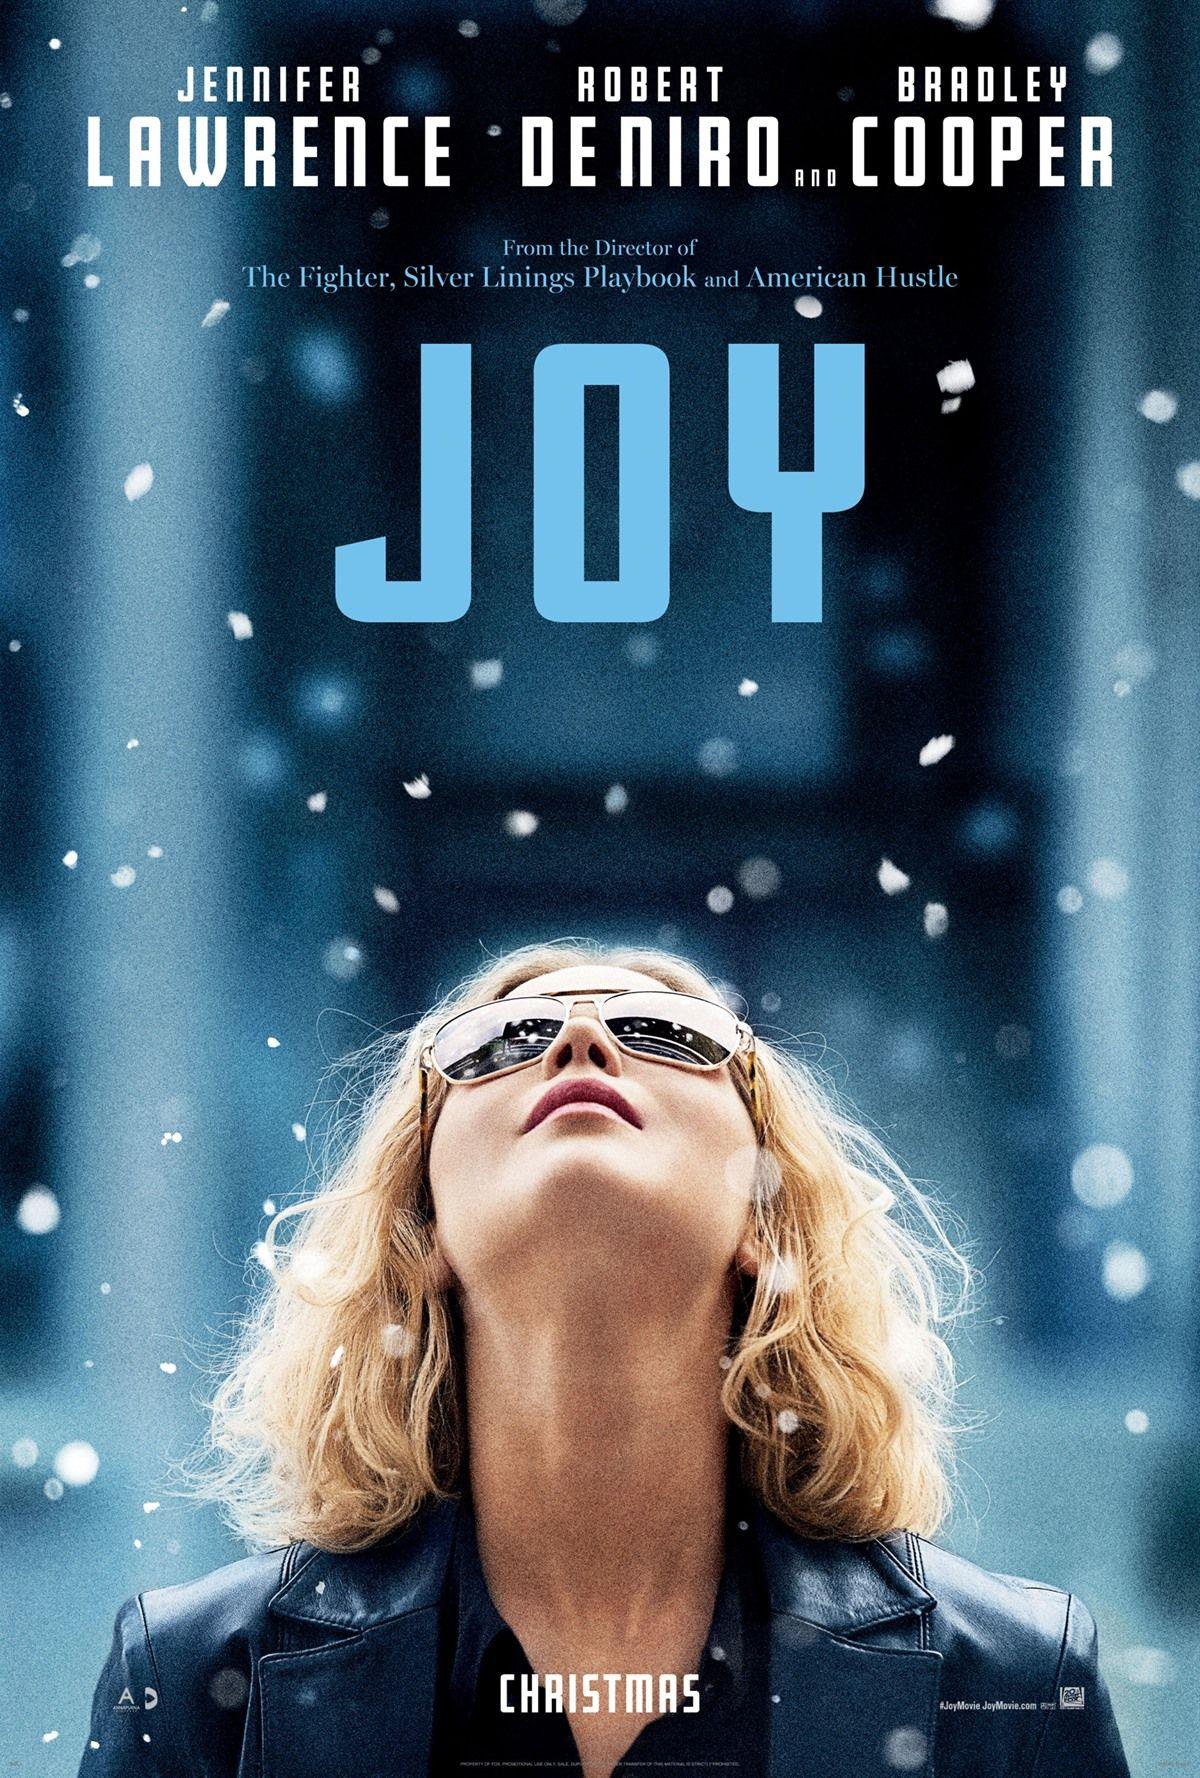 Jennifer Lawrence Looks Up In The New Poster For Joy Peliculas Peliculas Online Gratis Peliculas Cine